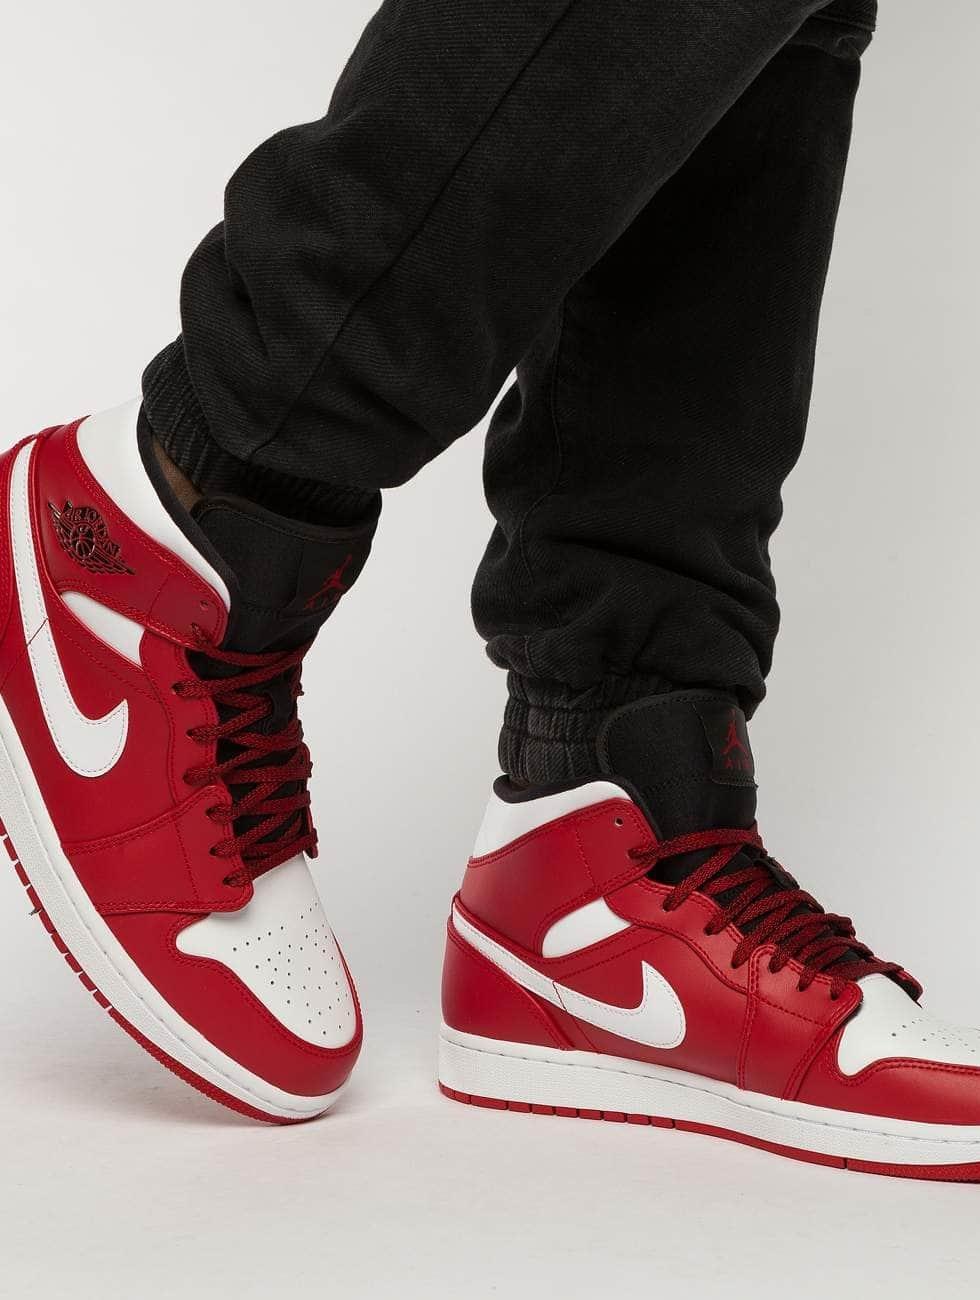 Jordan Sneakers 1 Mid red